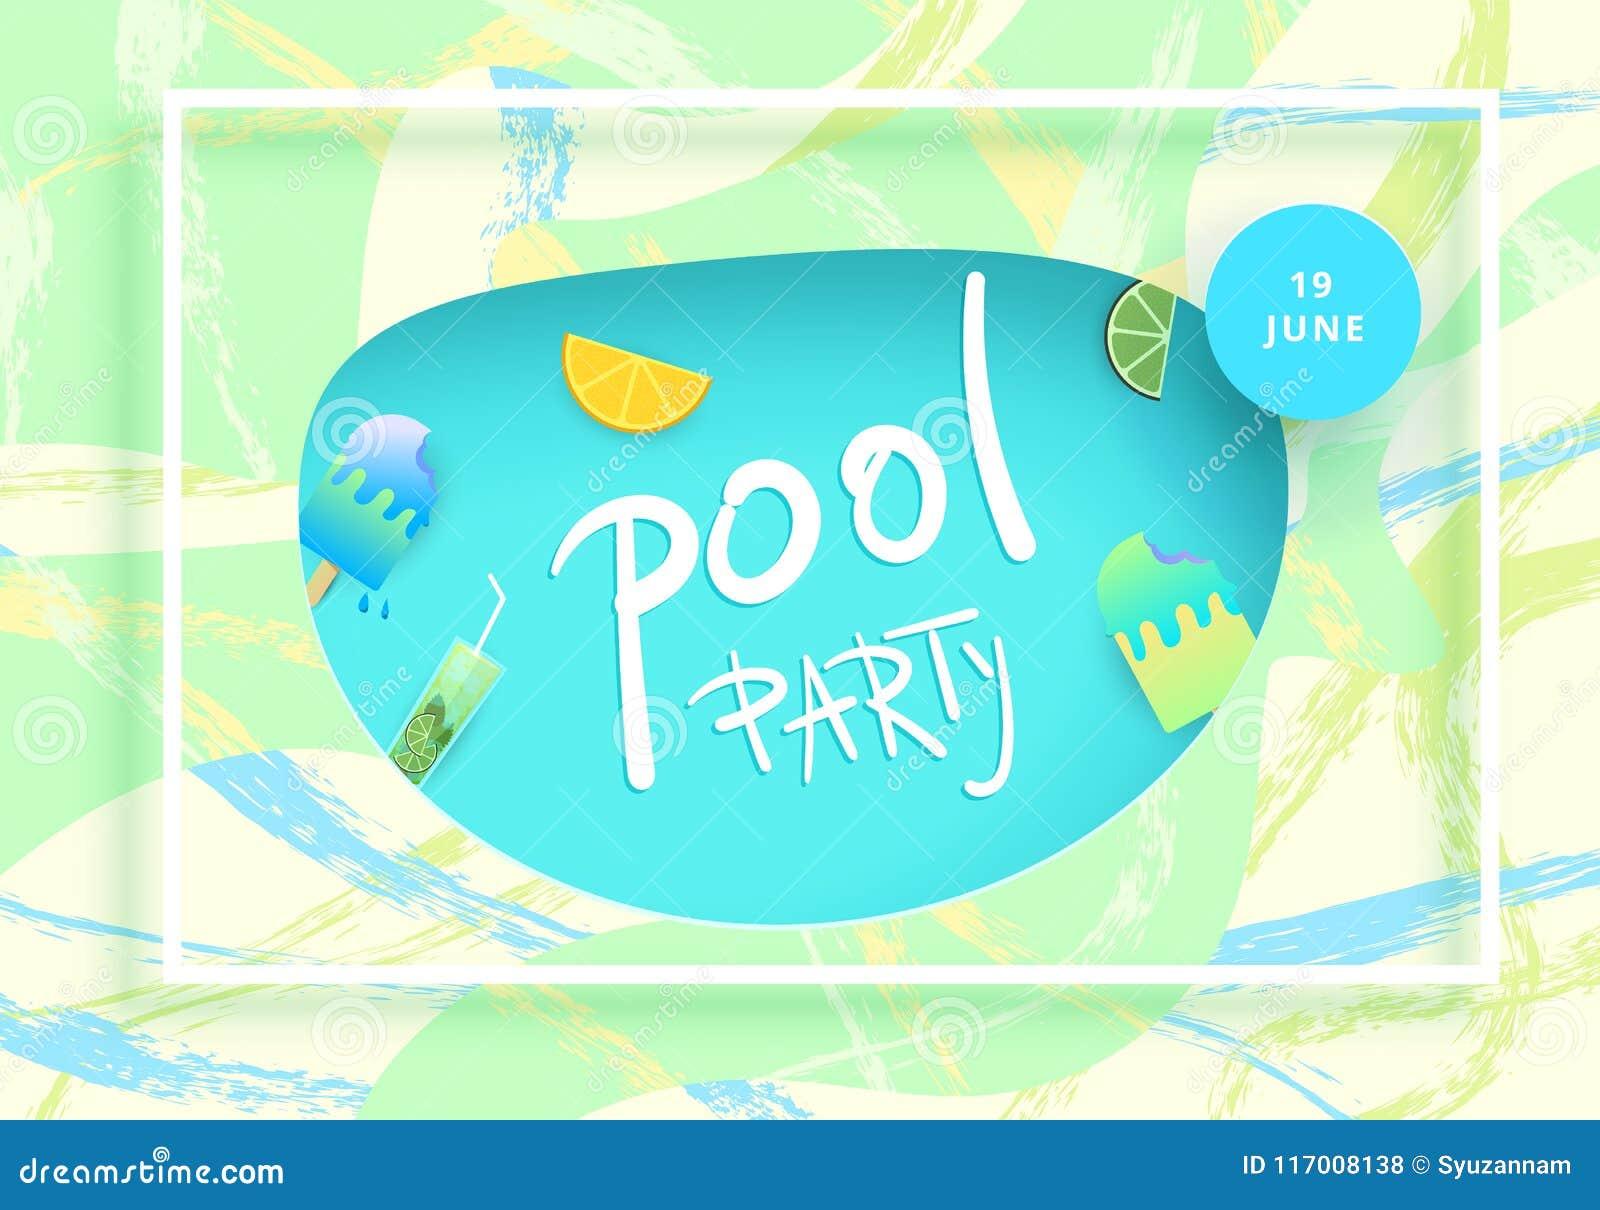 Pool Party Flyer Vector Illustration Stock Vector Illustration